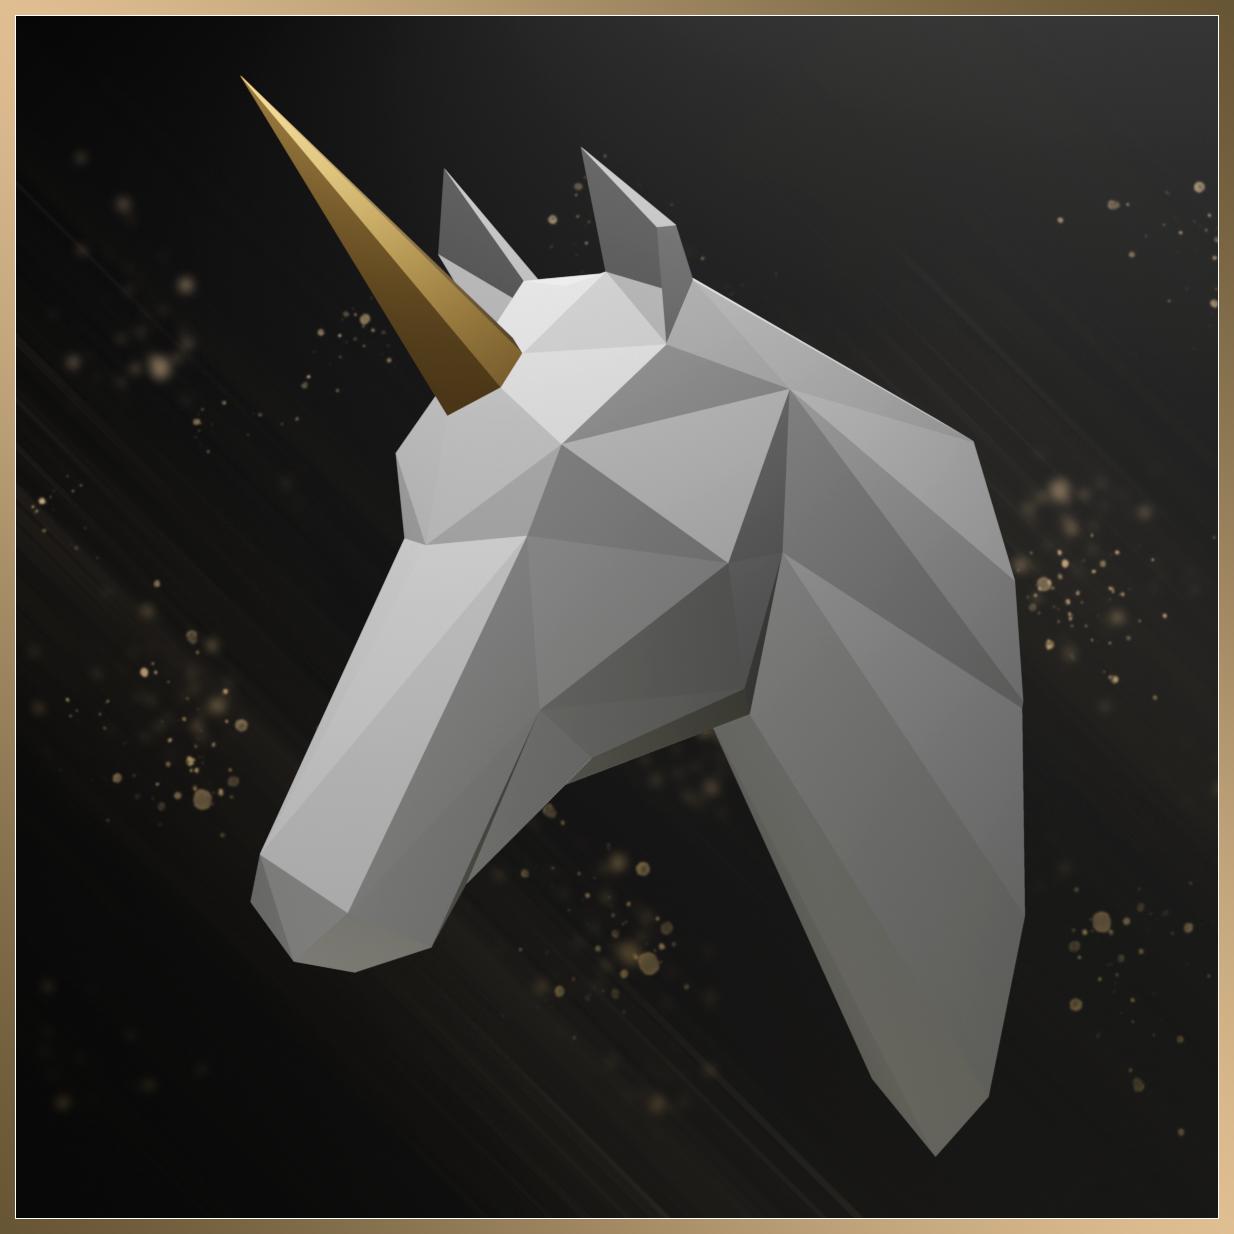 3D Unicorn Head Papercraft Project